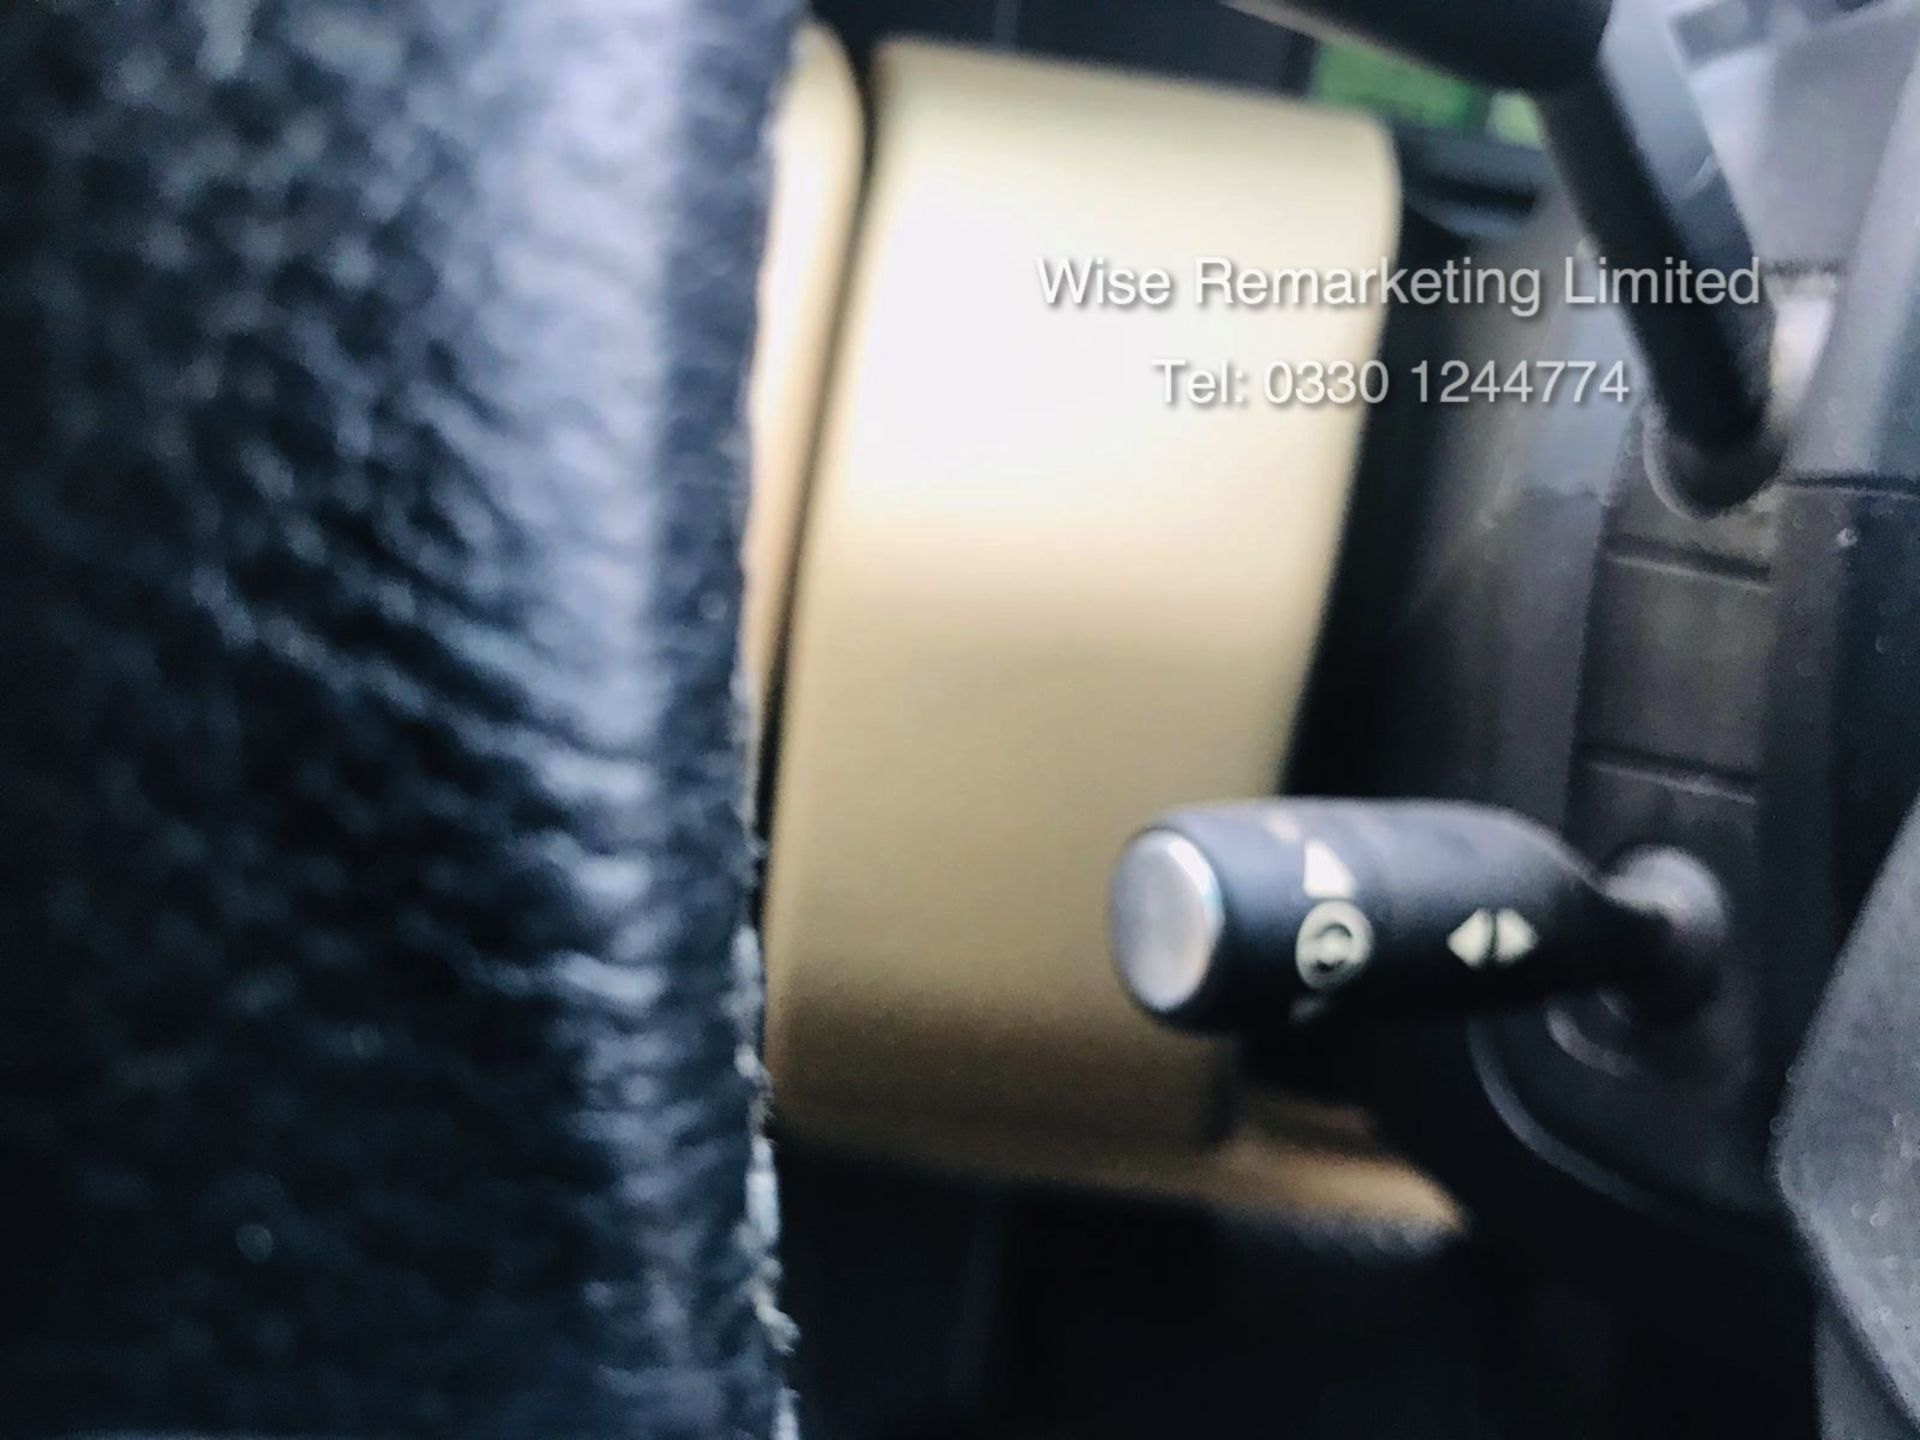 Range Rover Vogue 3.6 TDV8 HSE Auto - 2010 Model - Cream Leather - Service History - - Image 26 of 28